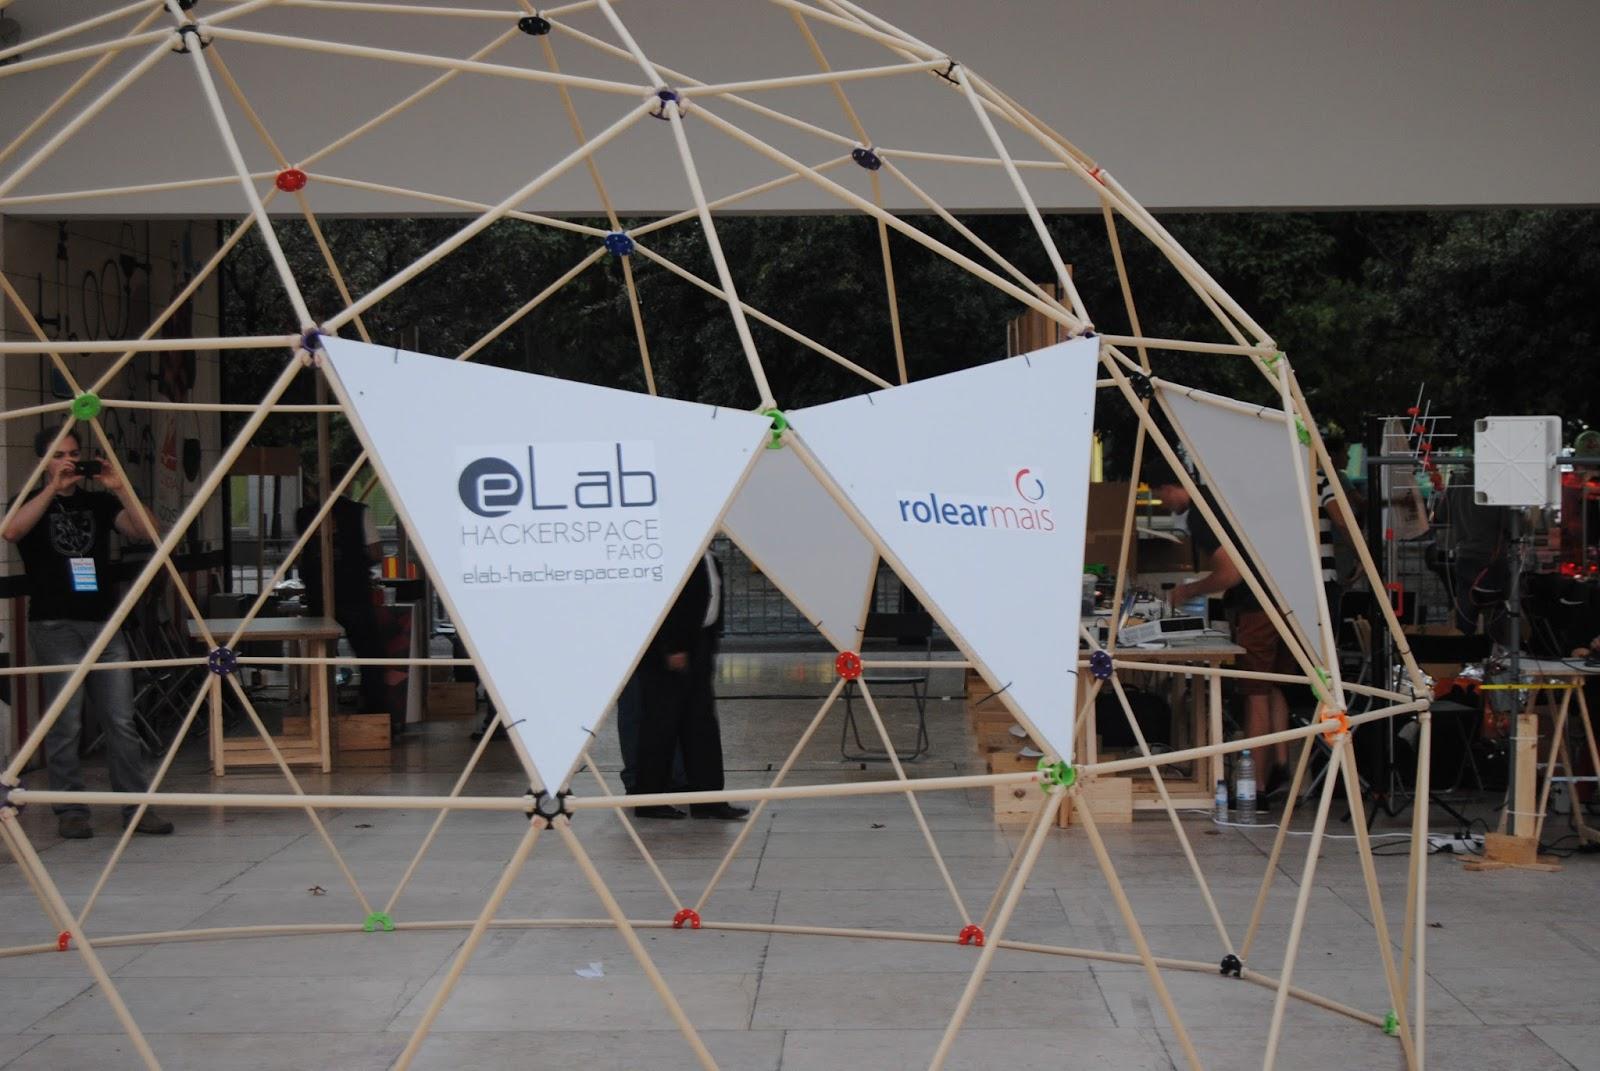 http://www.elab-hackerspace.org/2015/09/08/geodesic-dome/